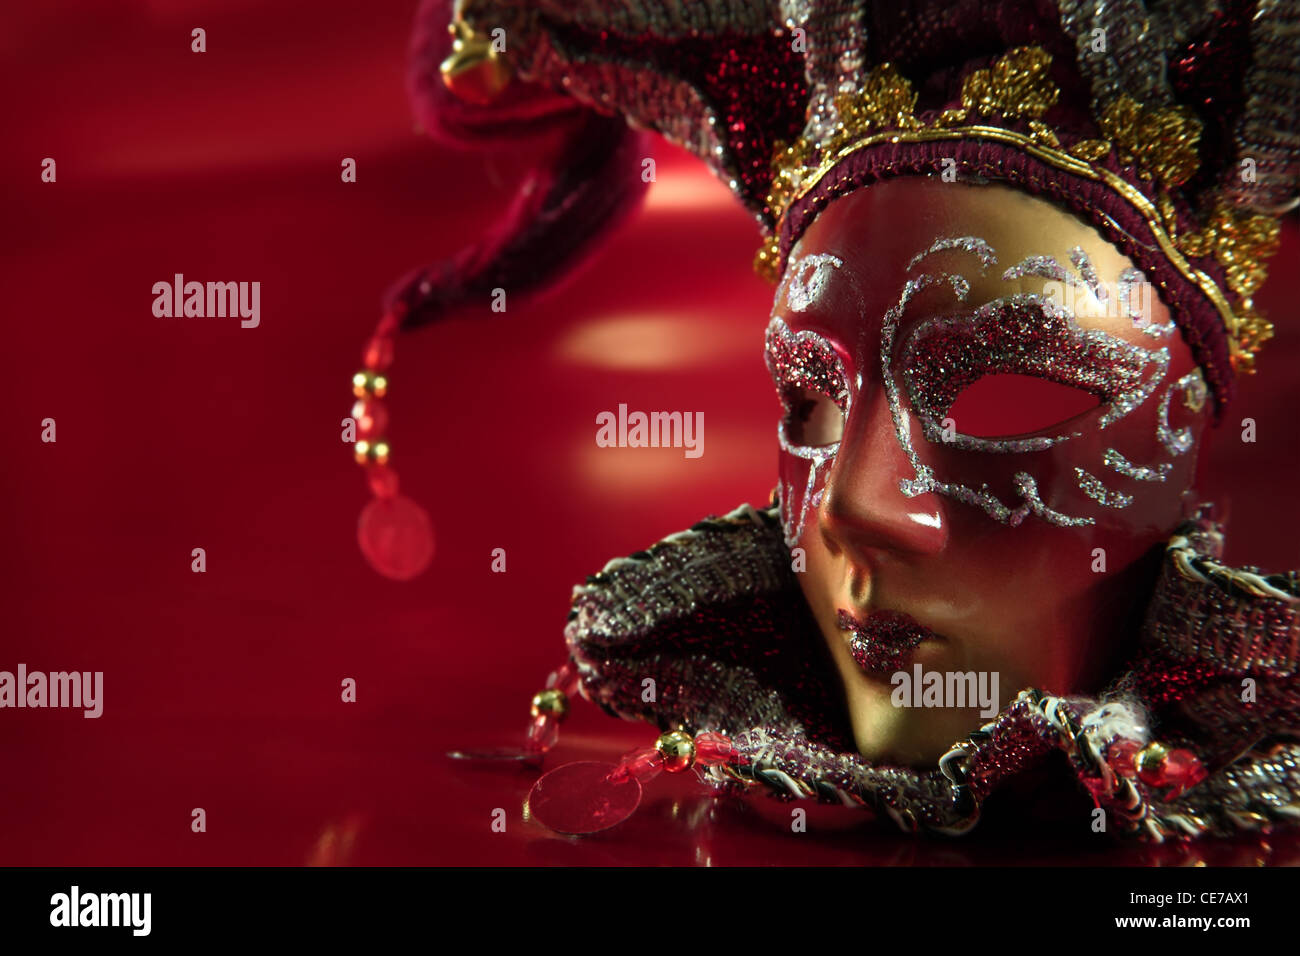 Ornate carnival mask. - Stock Image